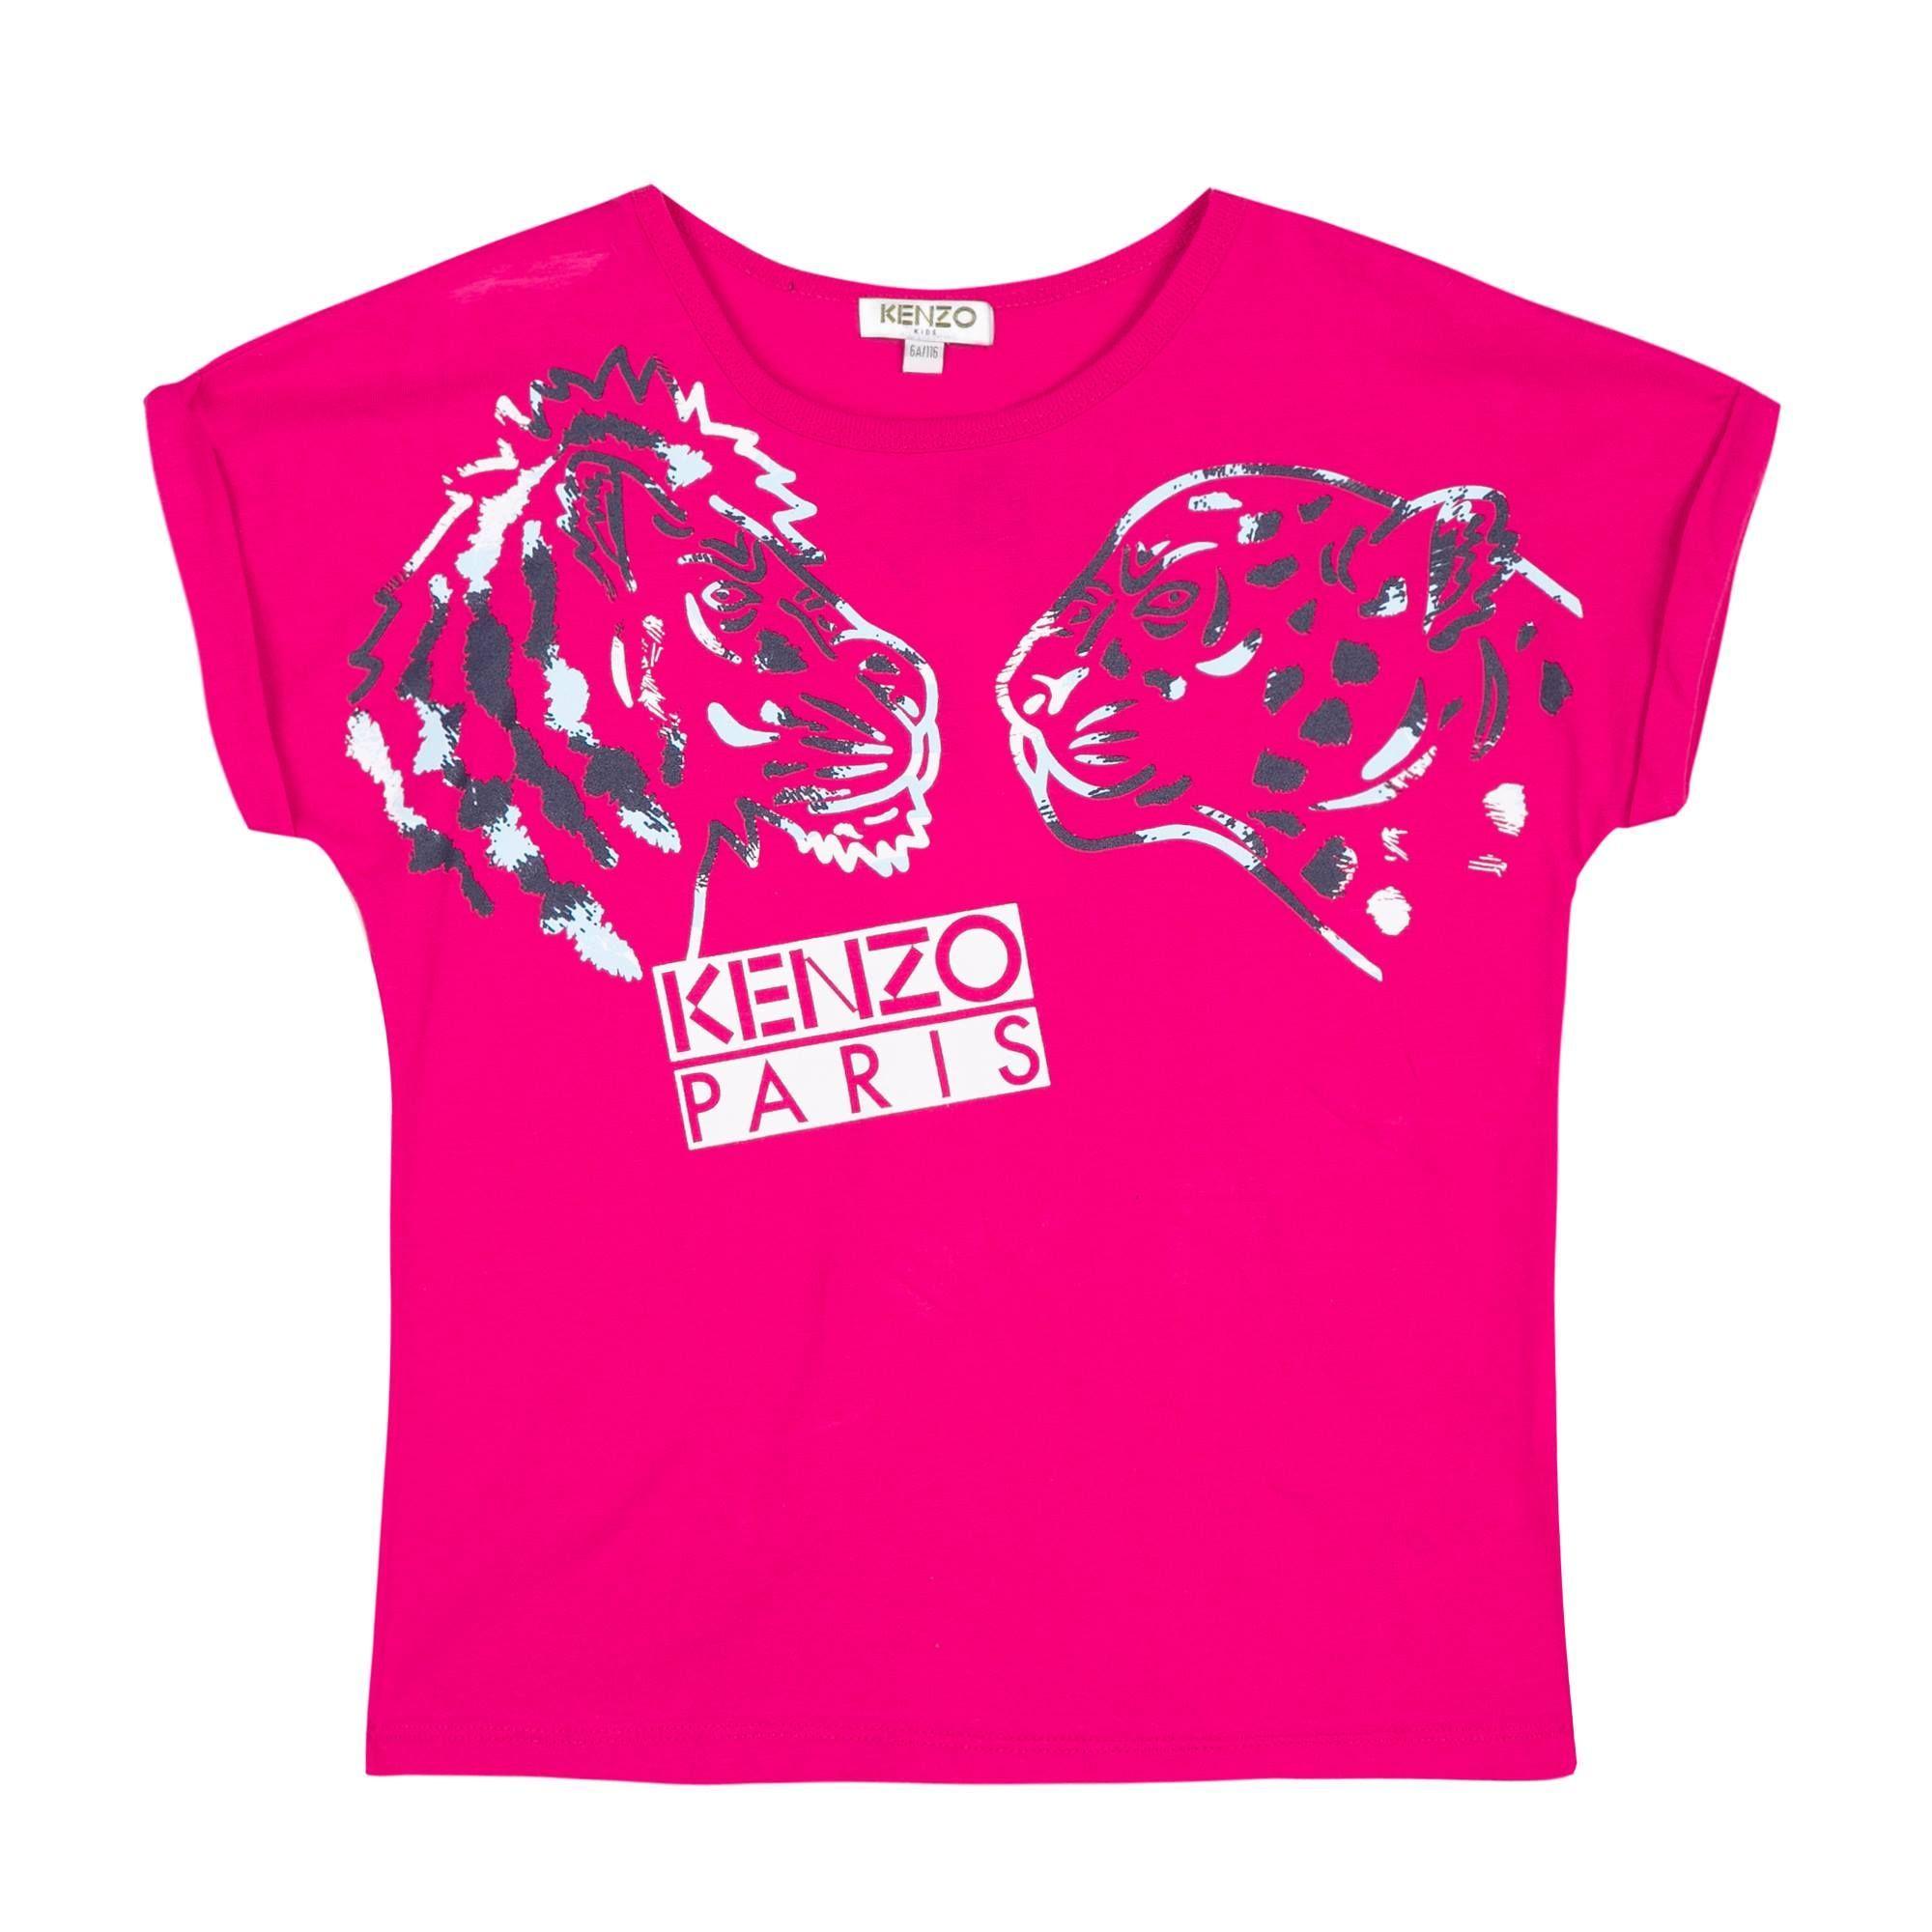 5d703dfb Kenzo 2018 SS Ready to Wear | Kenzo | Kenzo, Mens tops, Tween girls